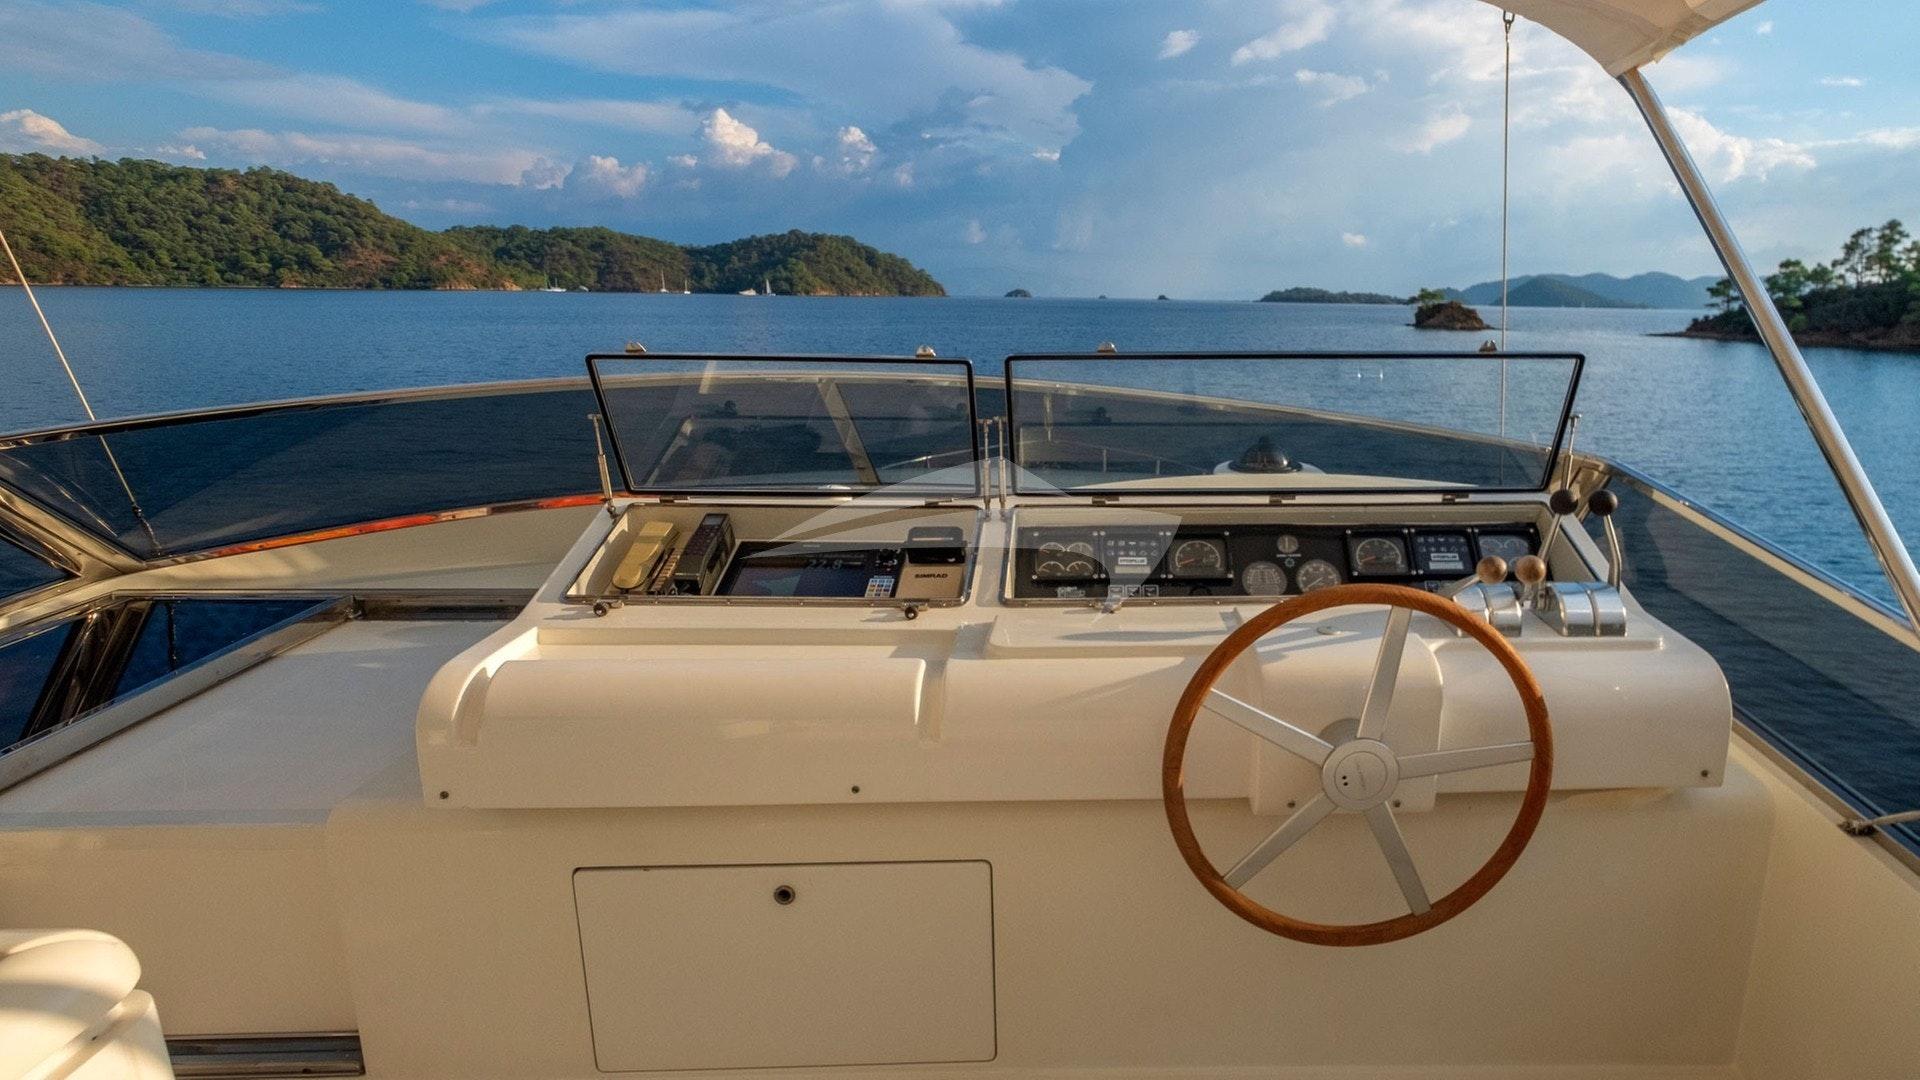 BarbarossaMoratti-SanLorenzo-72 for Charter-FlyBridge-03